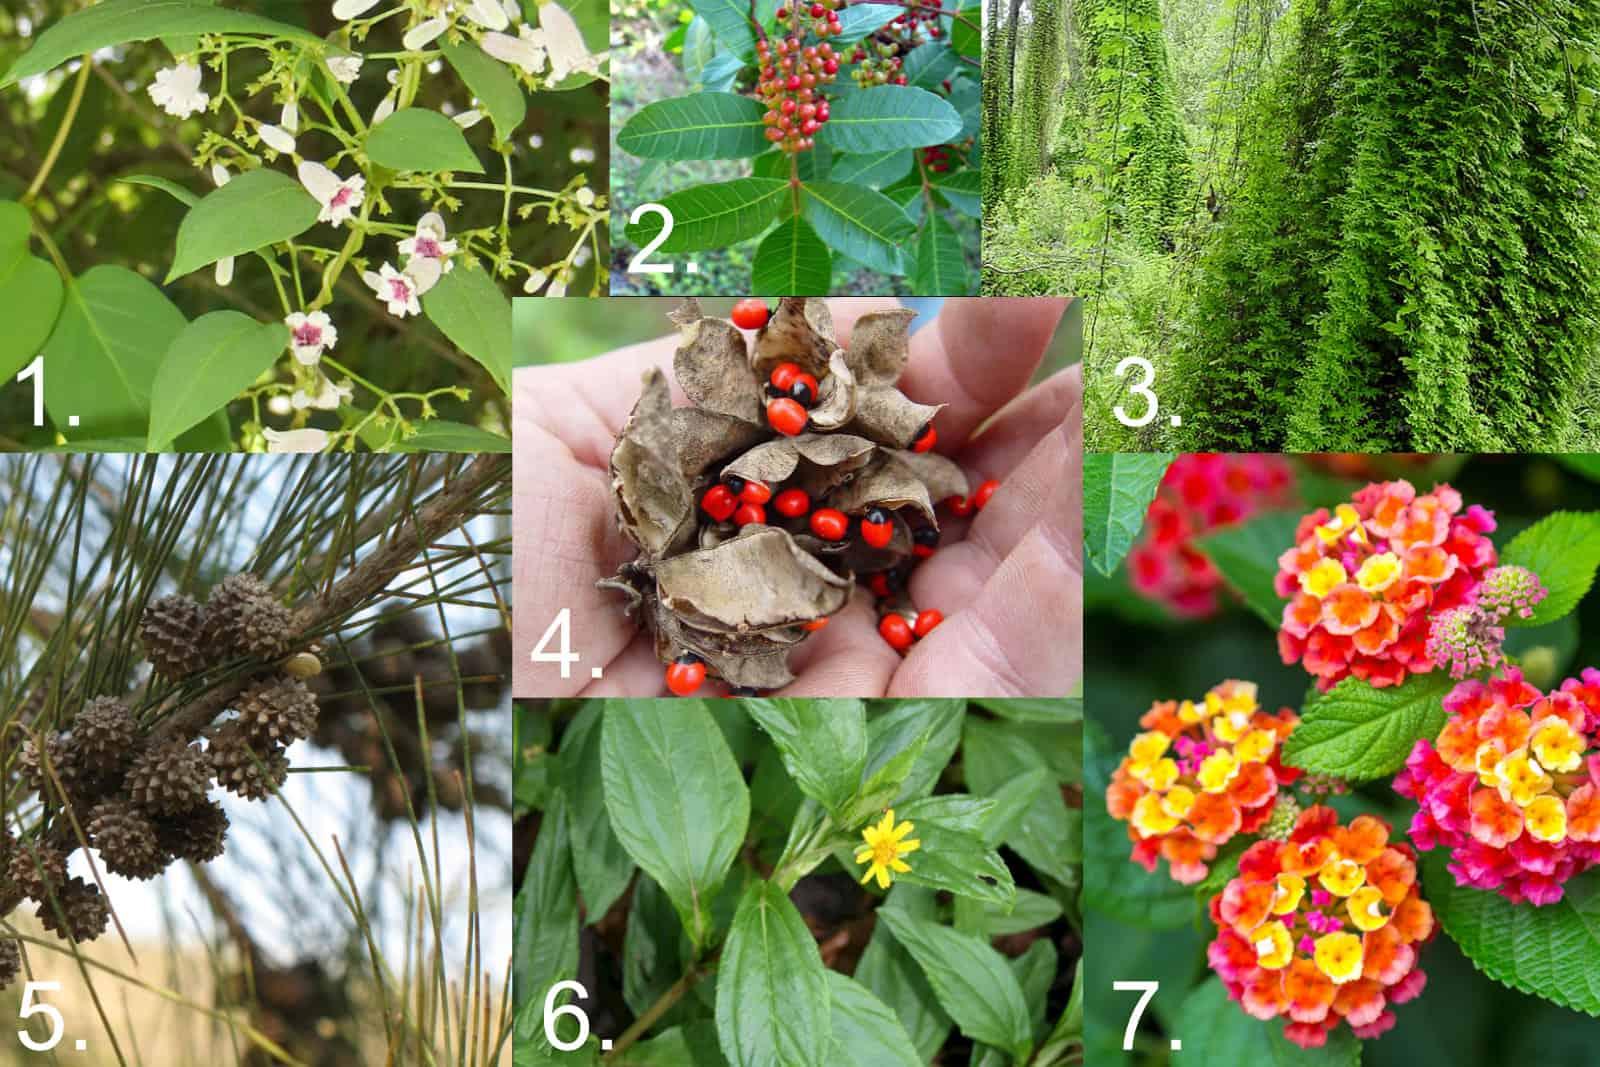 Florida Invasive Plants